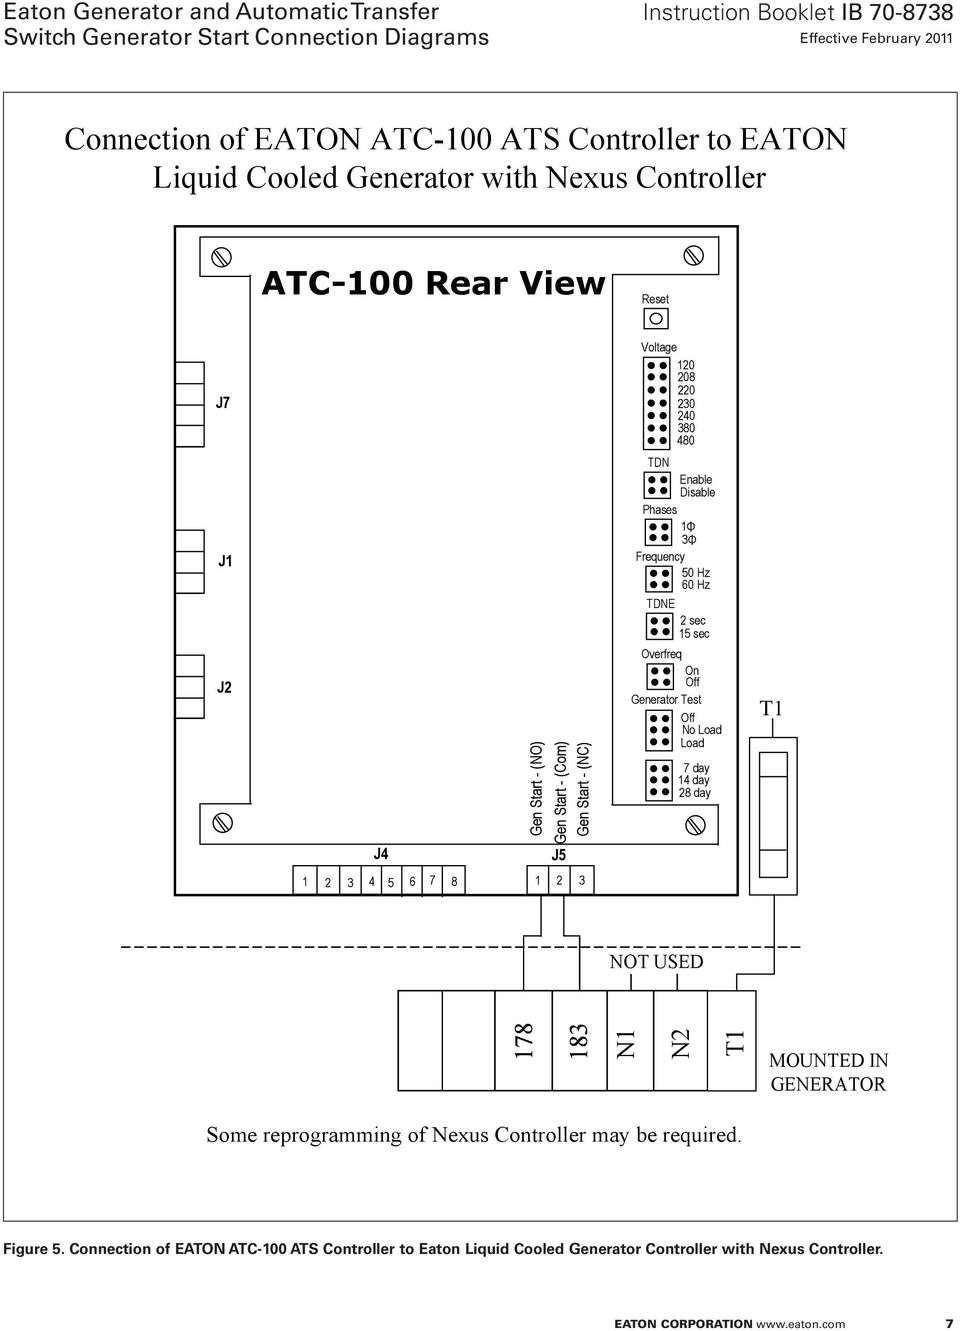 Eaton Manual Transfer Switch Wiring Diagram : Wiring diagram mustand l bakdesigns